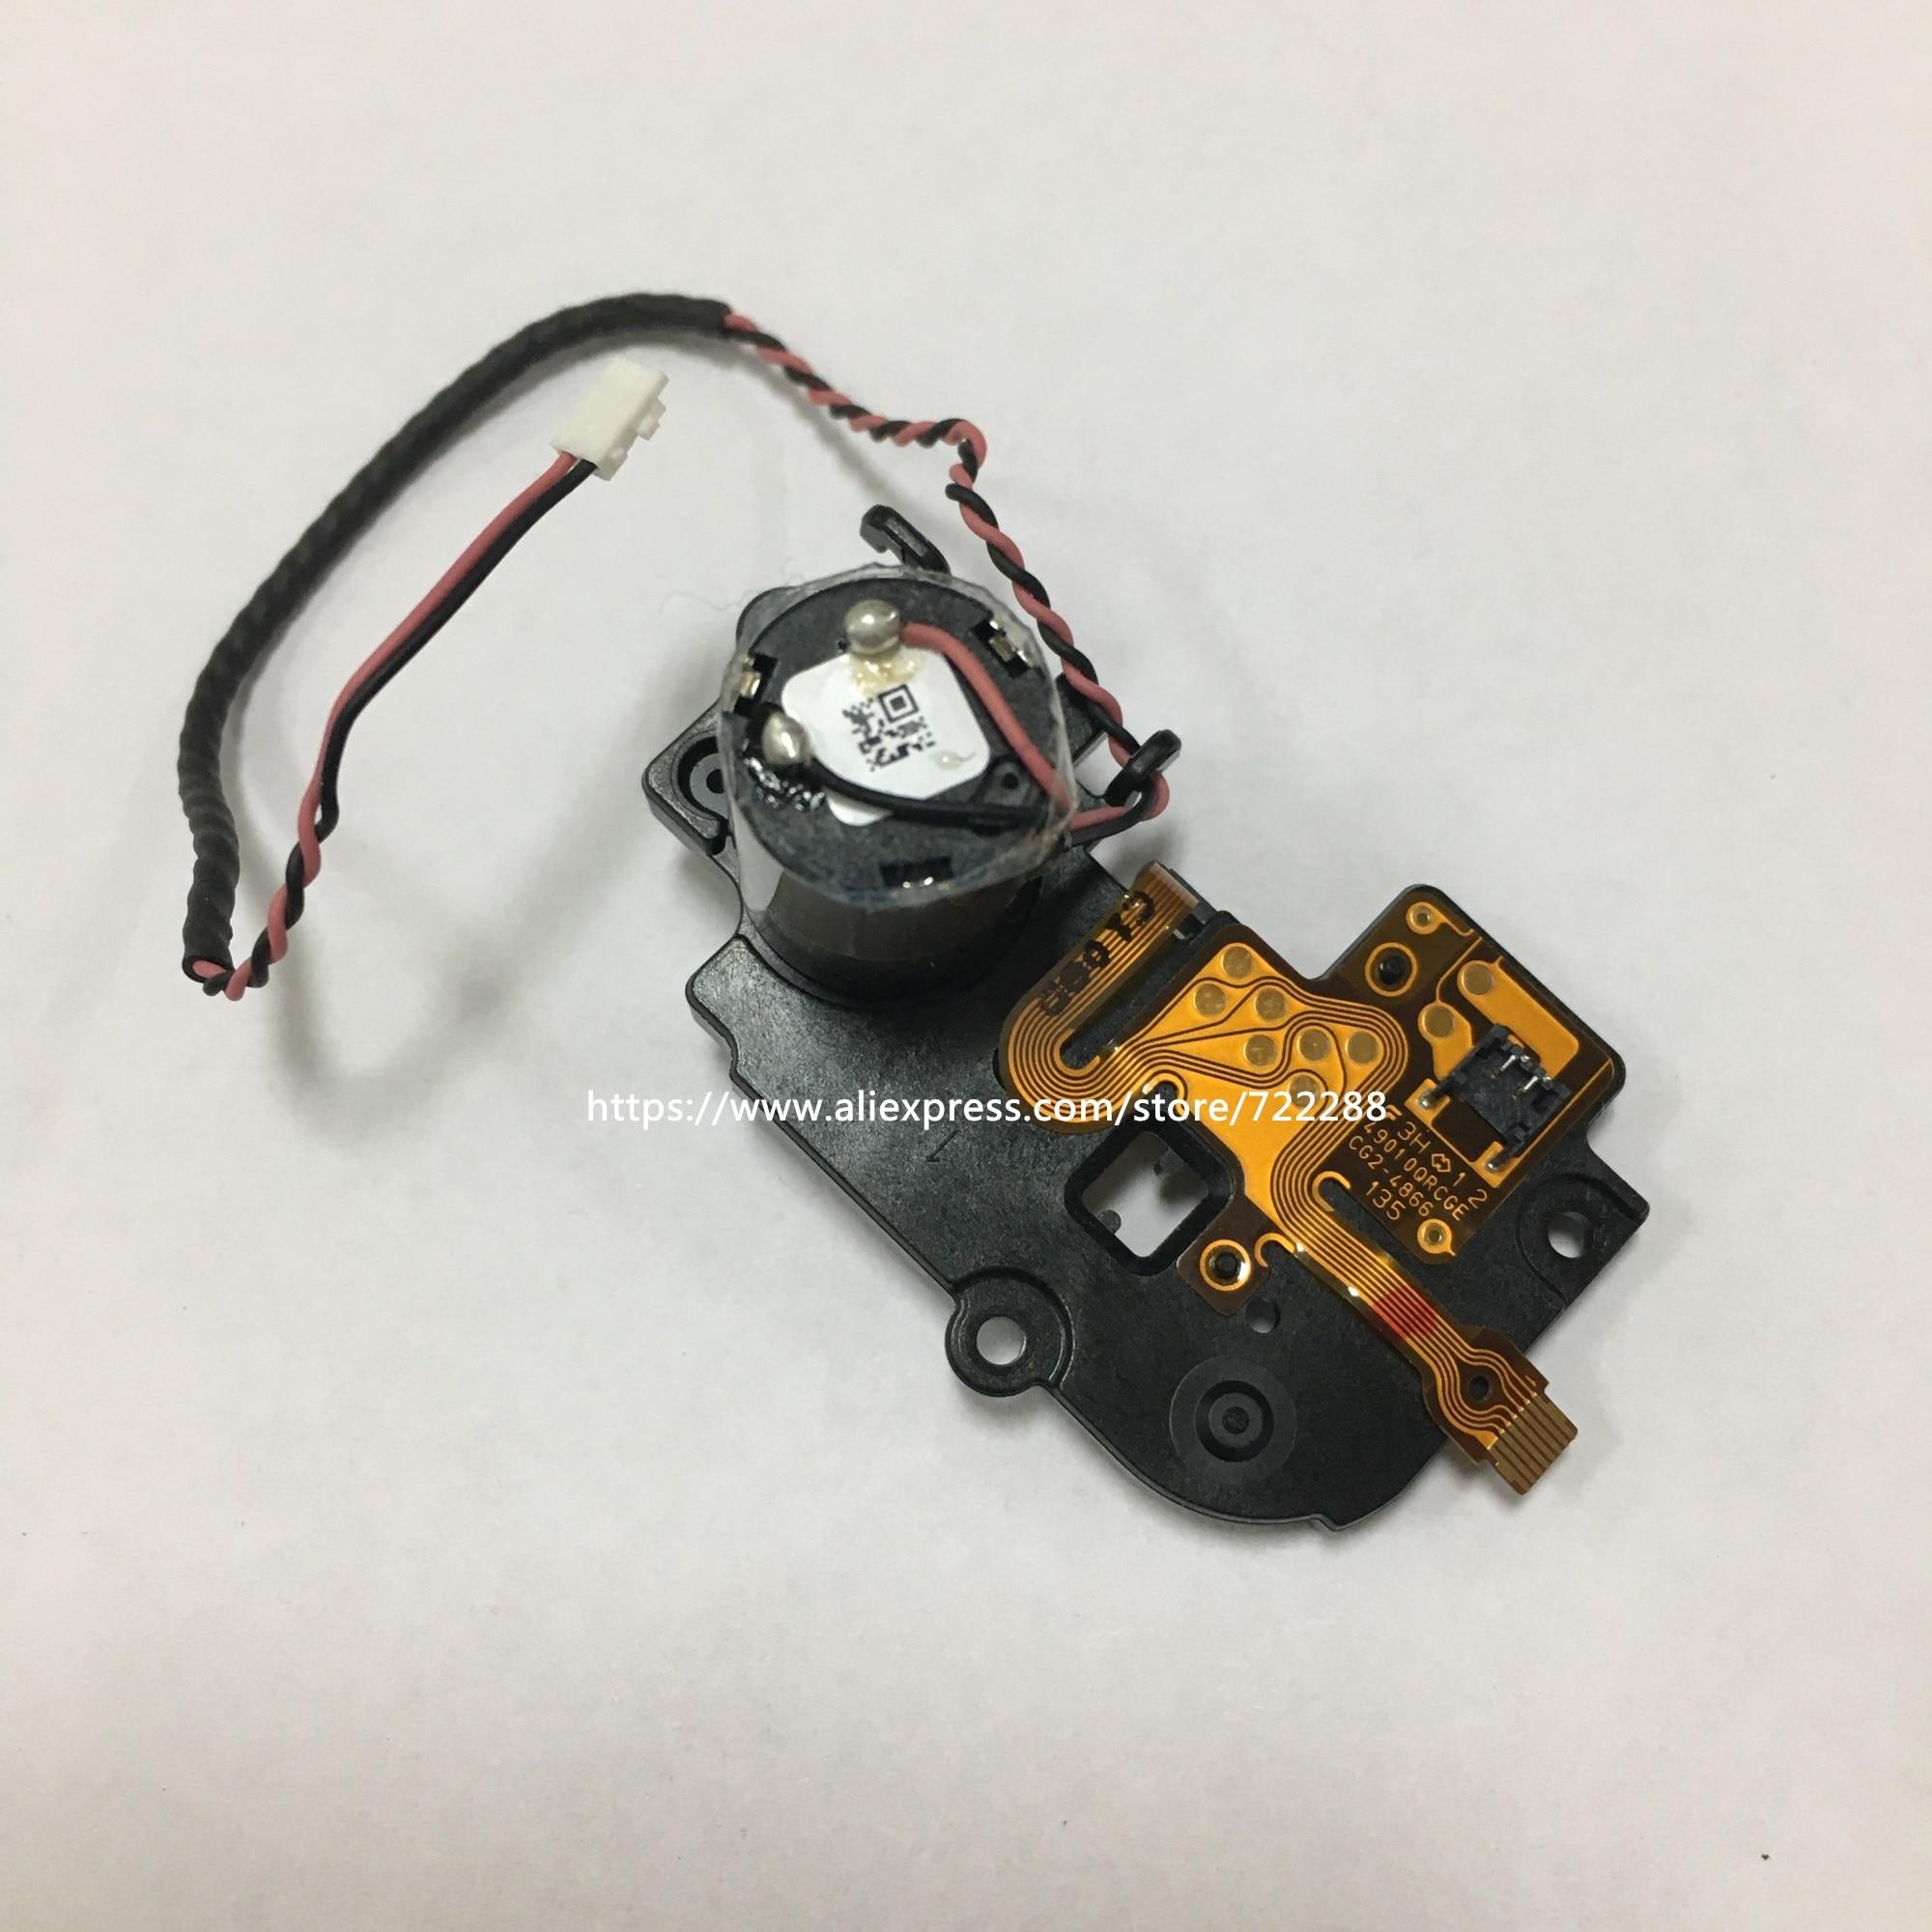 Repair Parts For Canon EOS 5D Mark IV Mirror Box Motor Unit CG2 4866 135